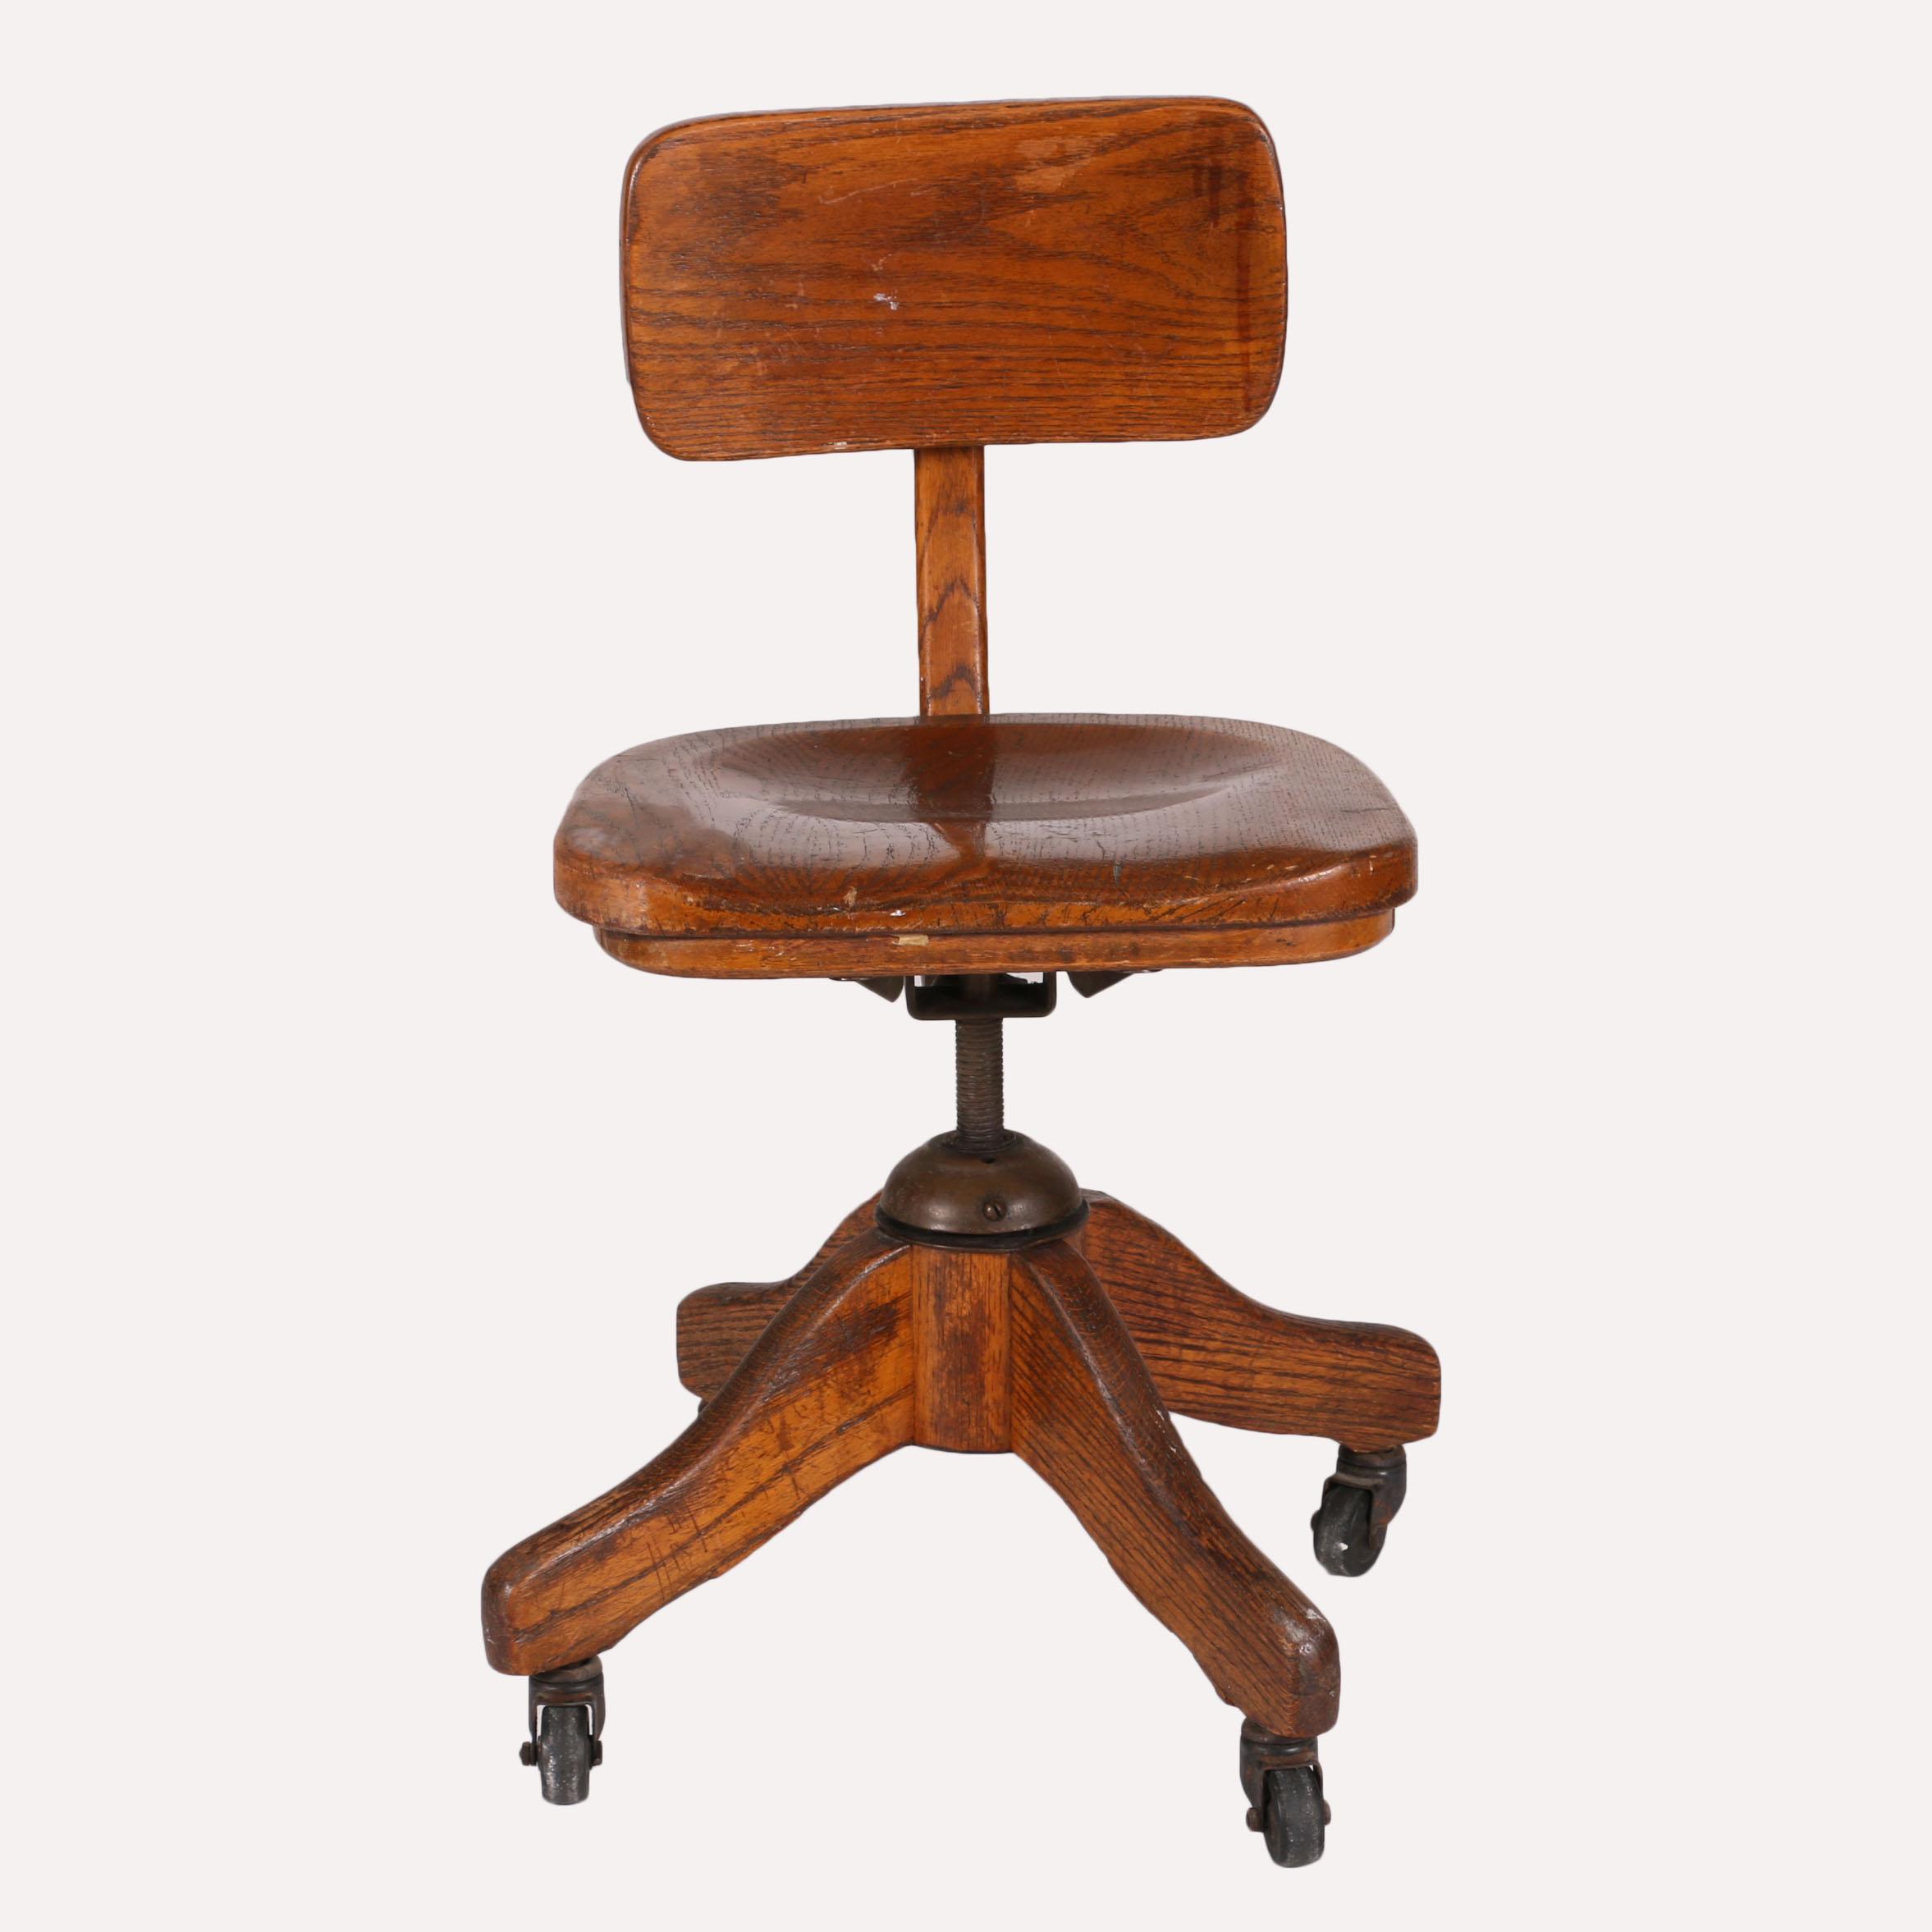 Vintage Wood Rolling Desk Chair EBTH